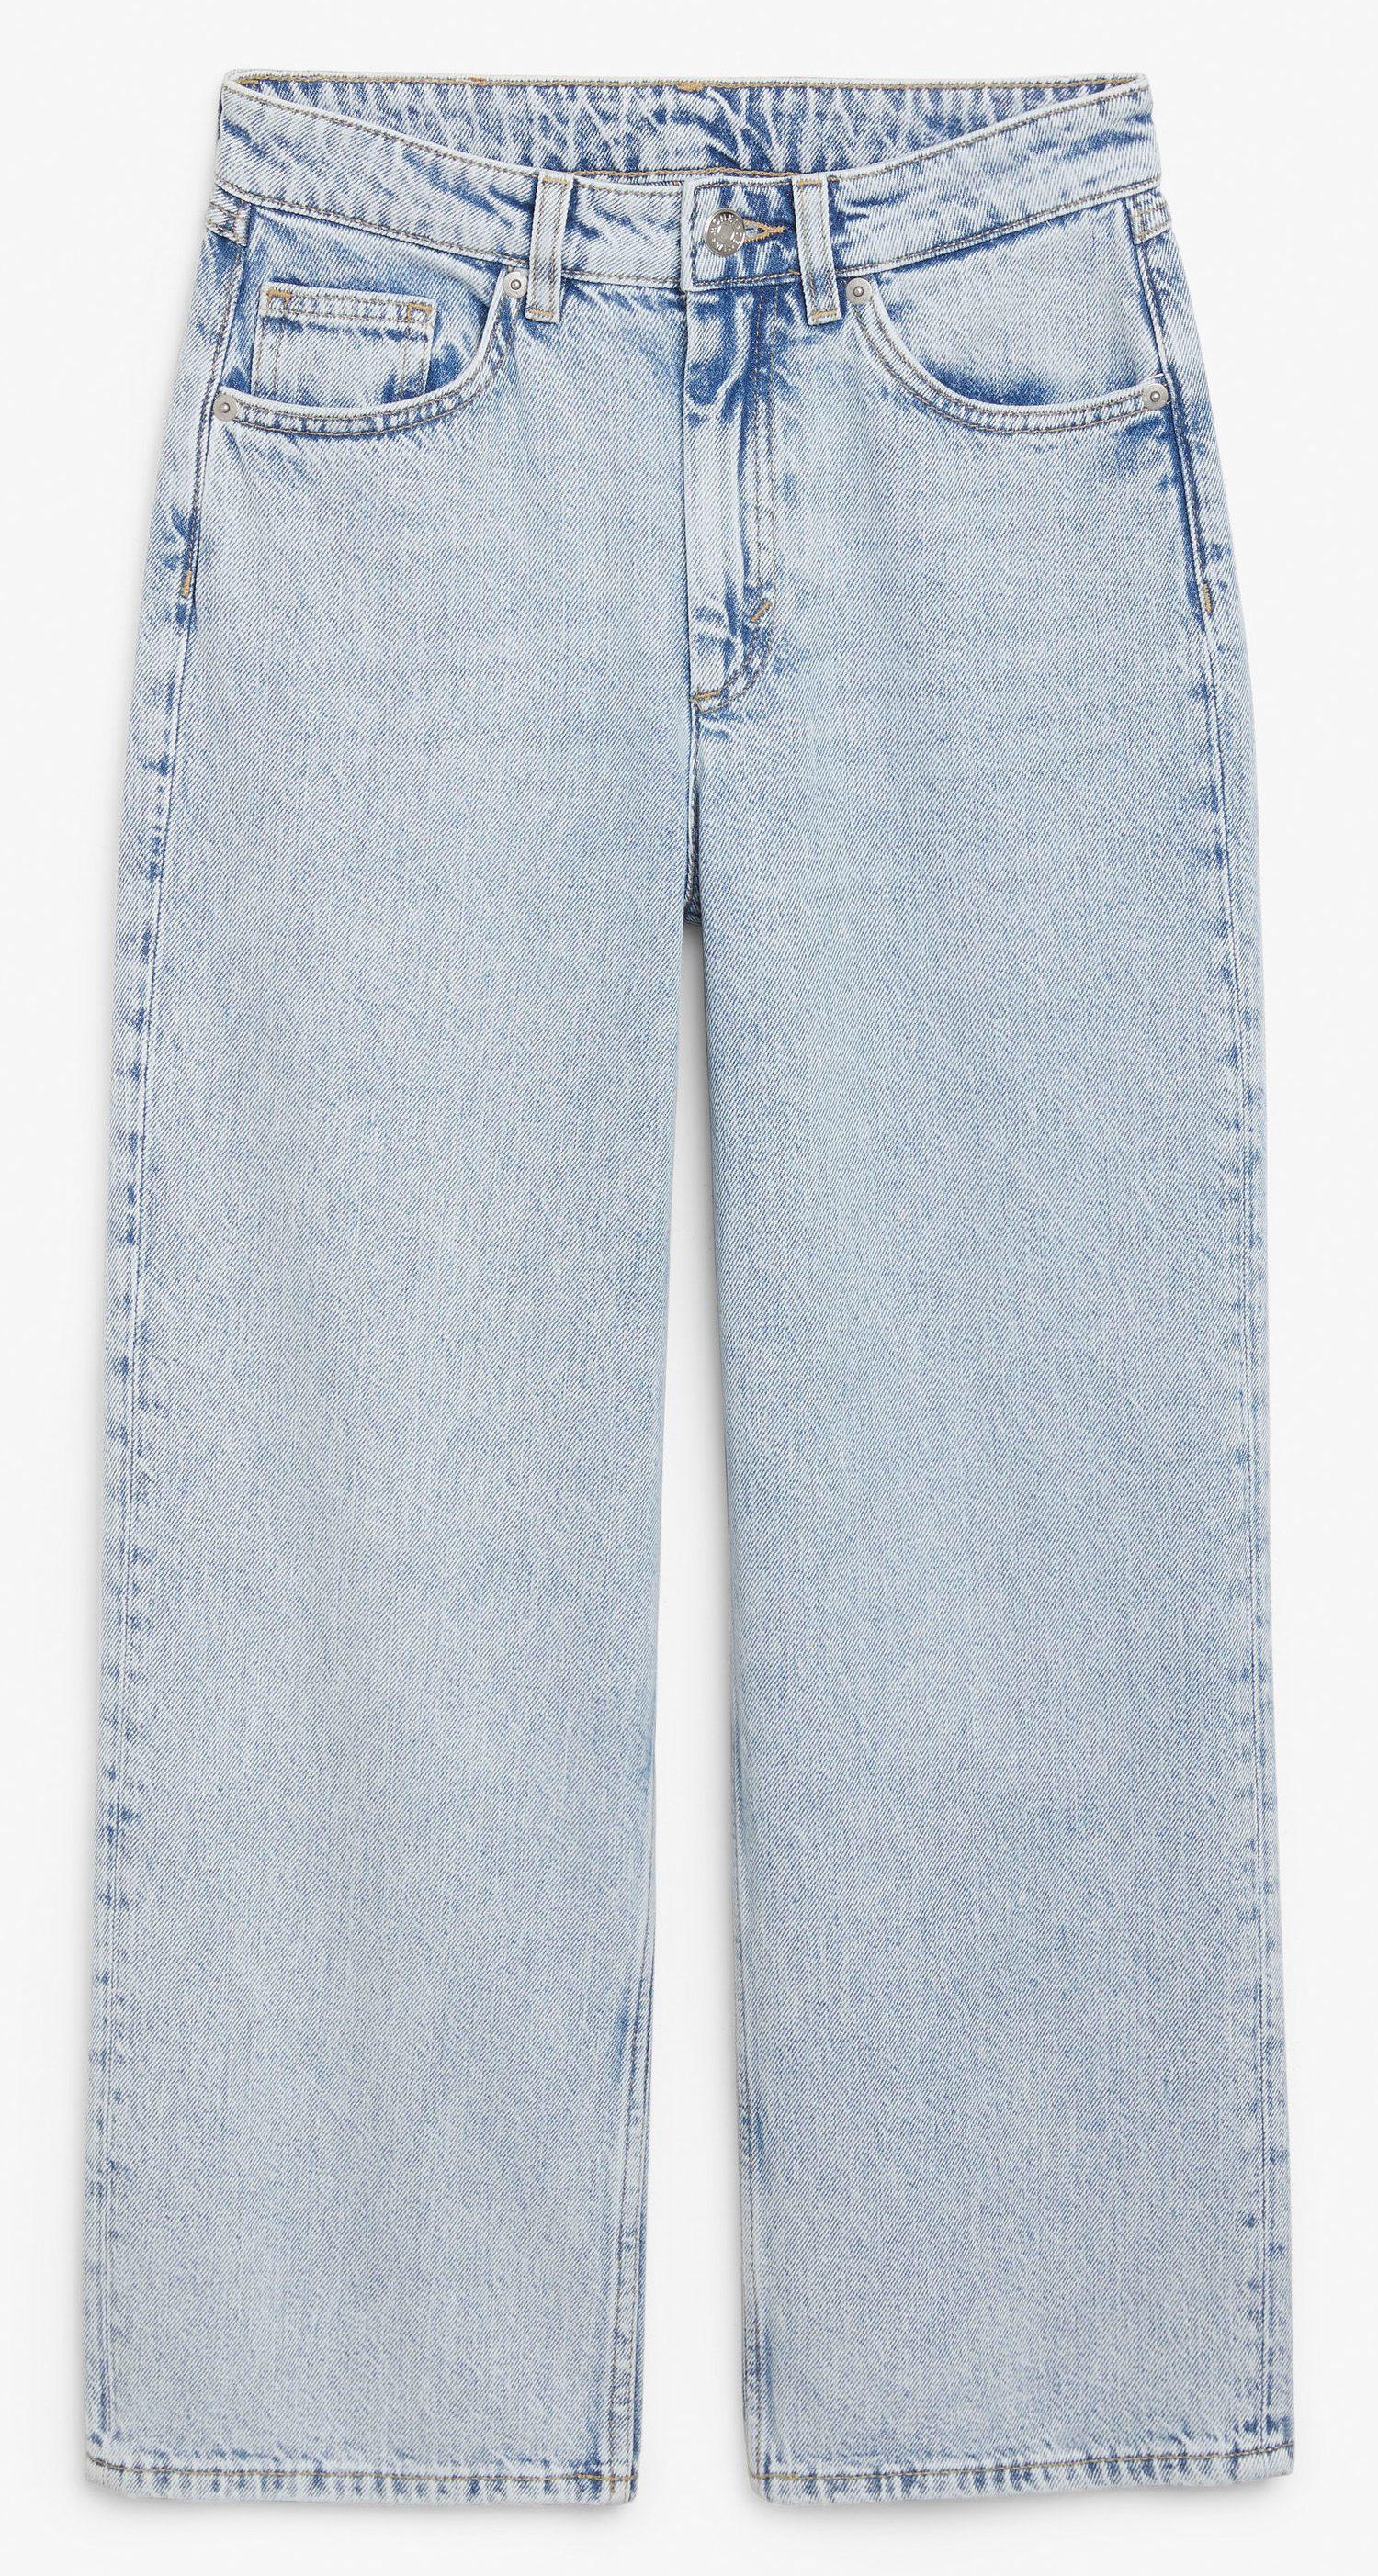 Lyseblåt denim, jeans. (Foto: PR)